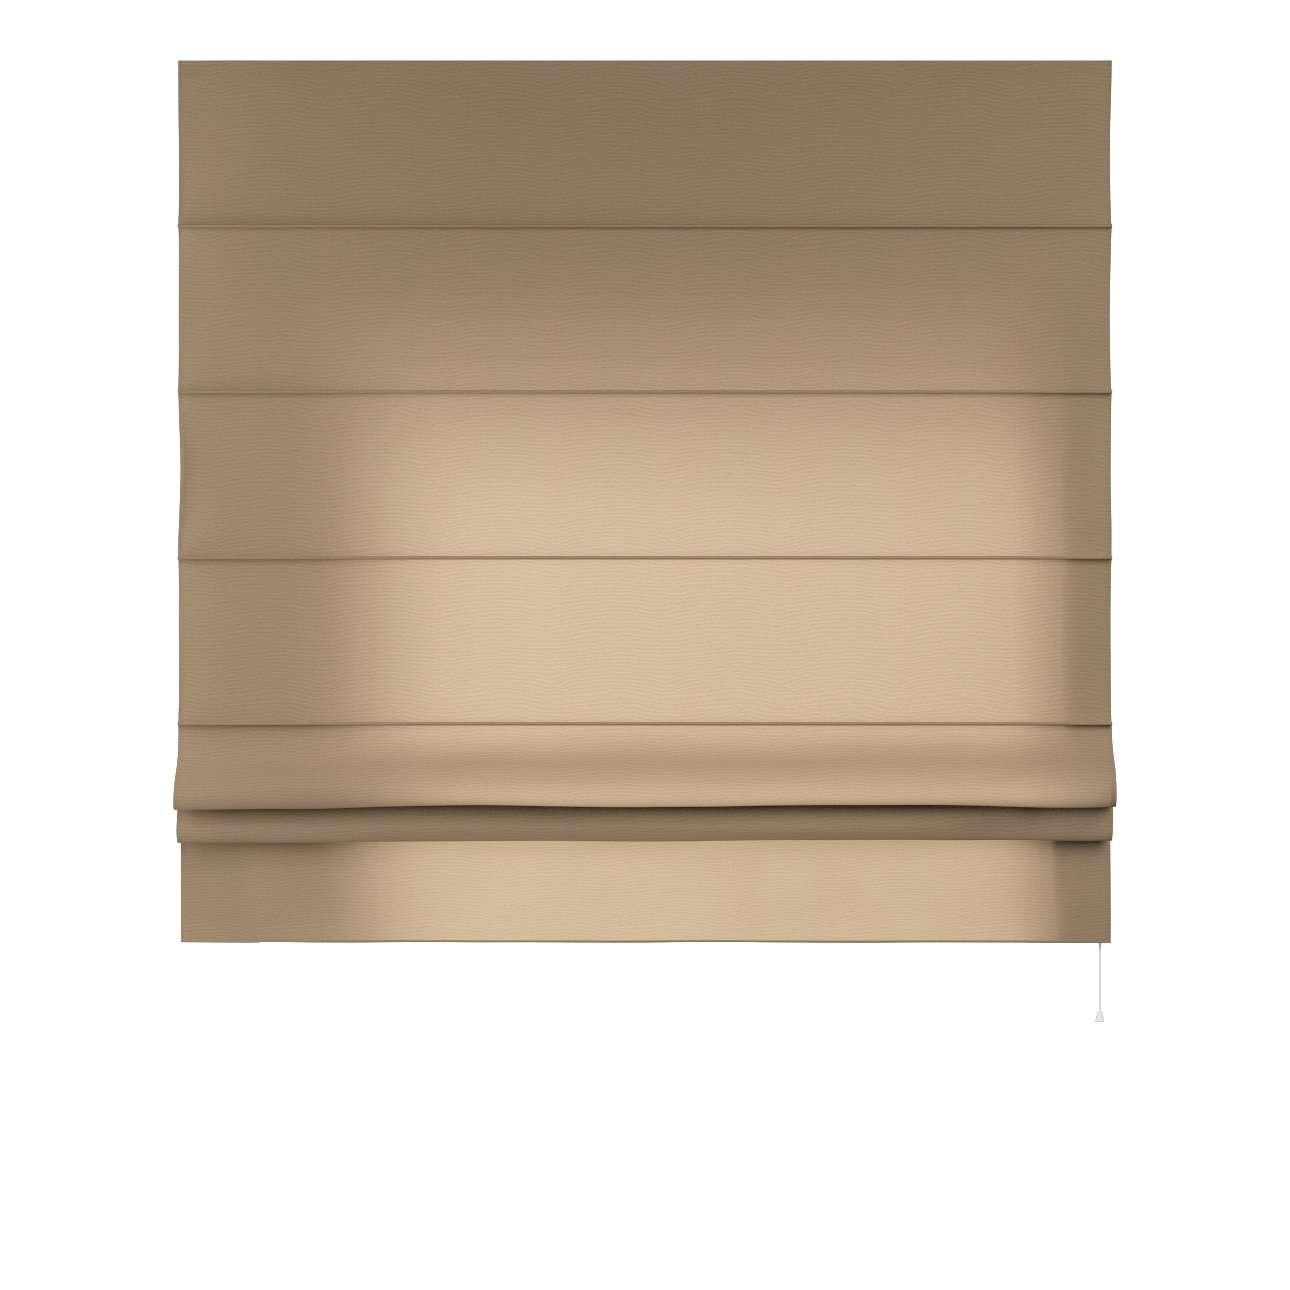 vouwgordijn Padva 80 x 170 cm van de collectie Quadro, Stof: 136-09